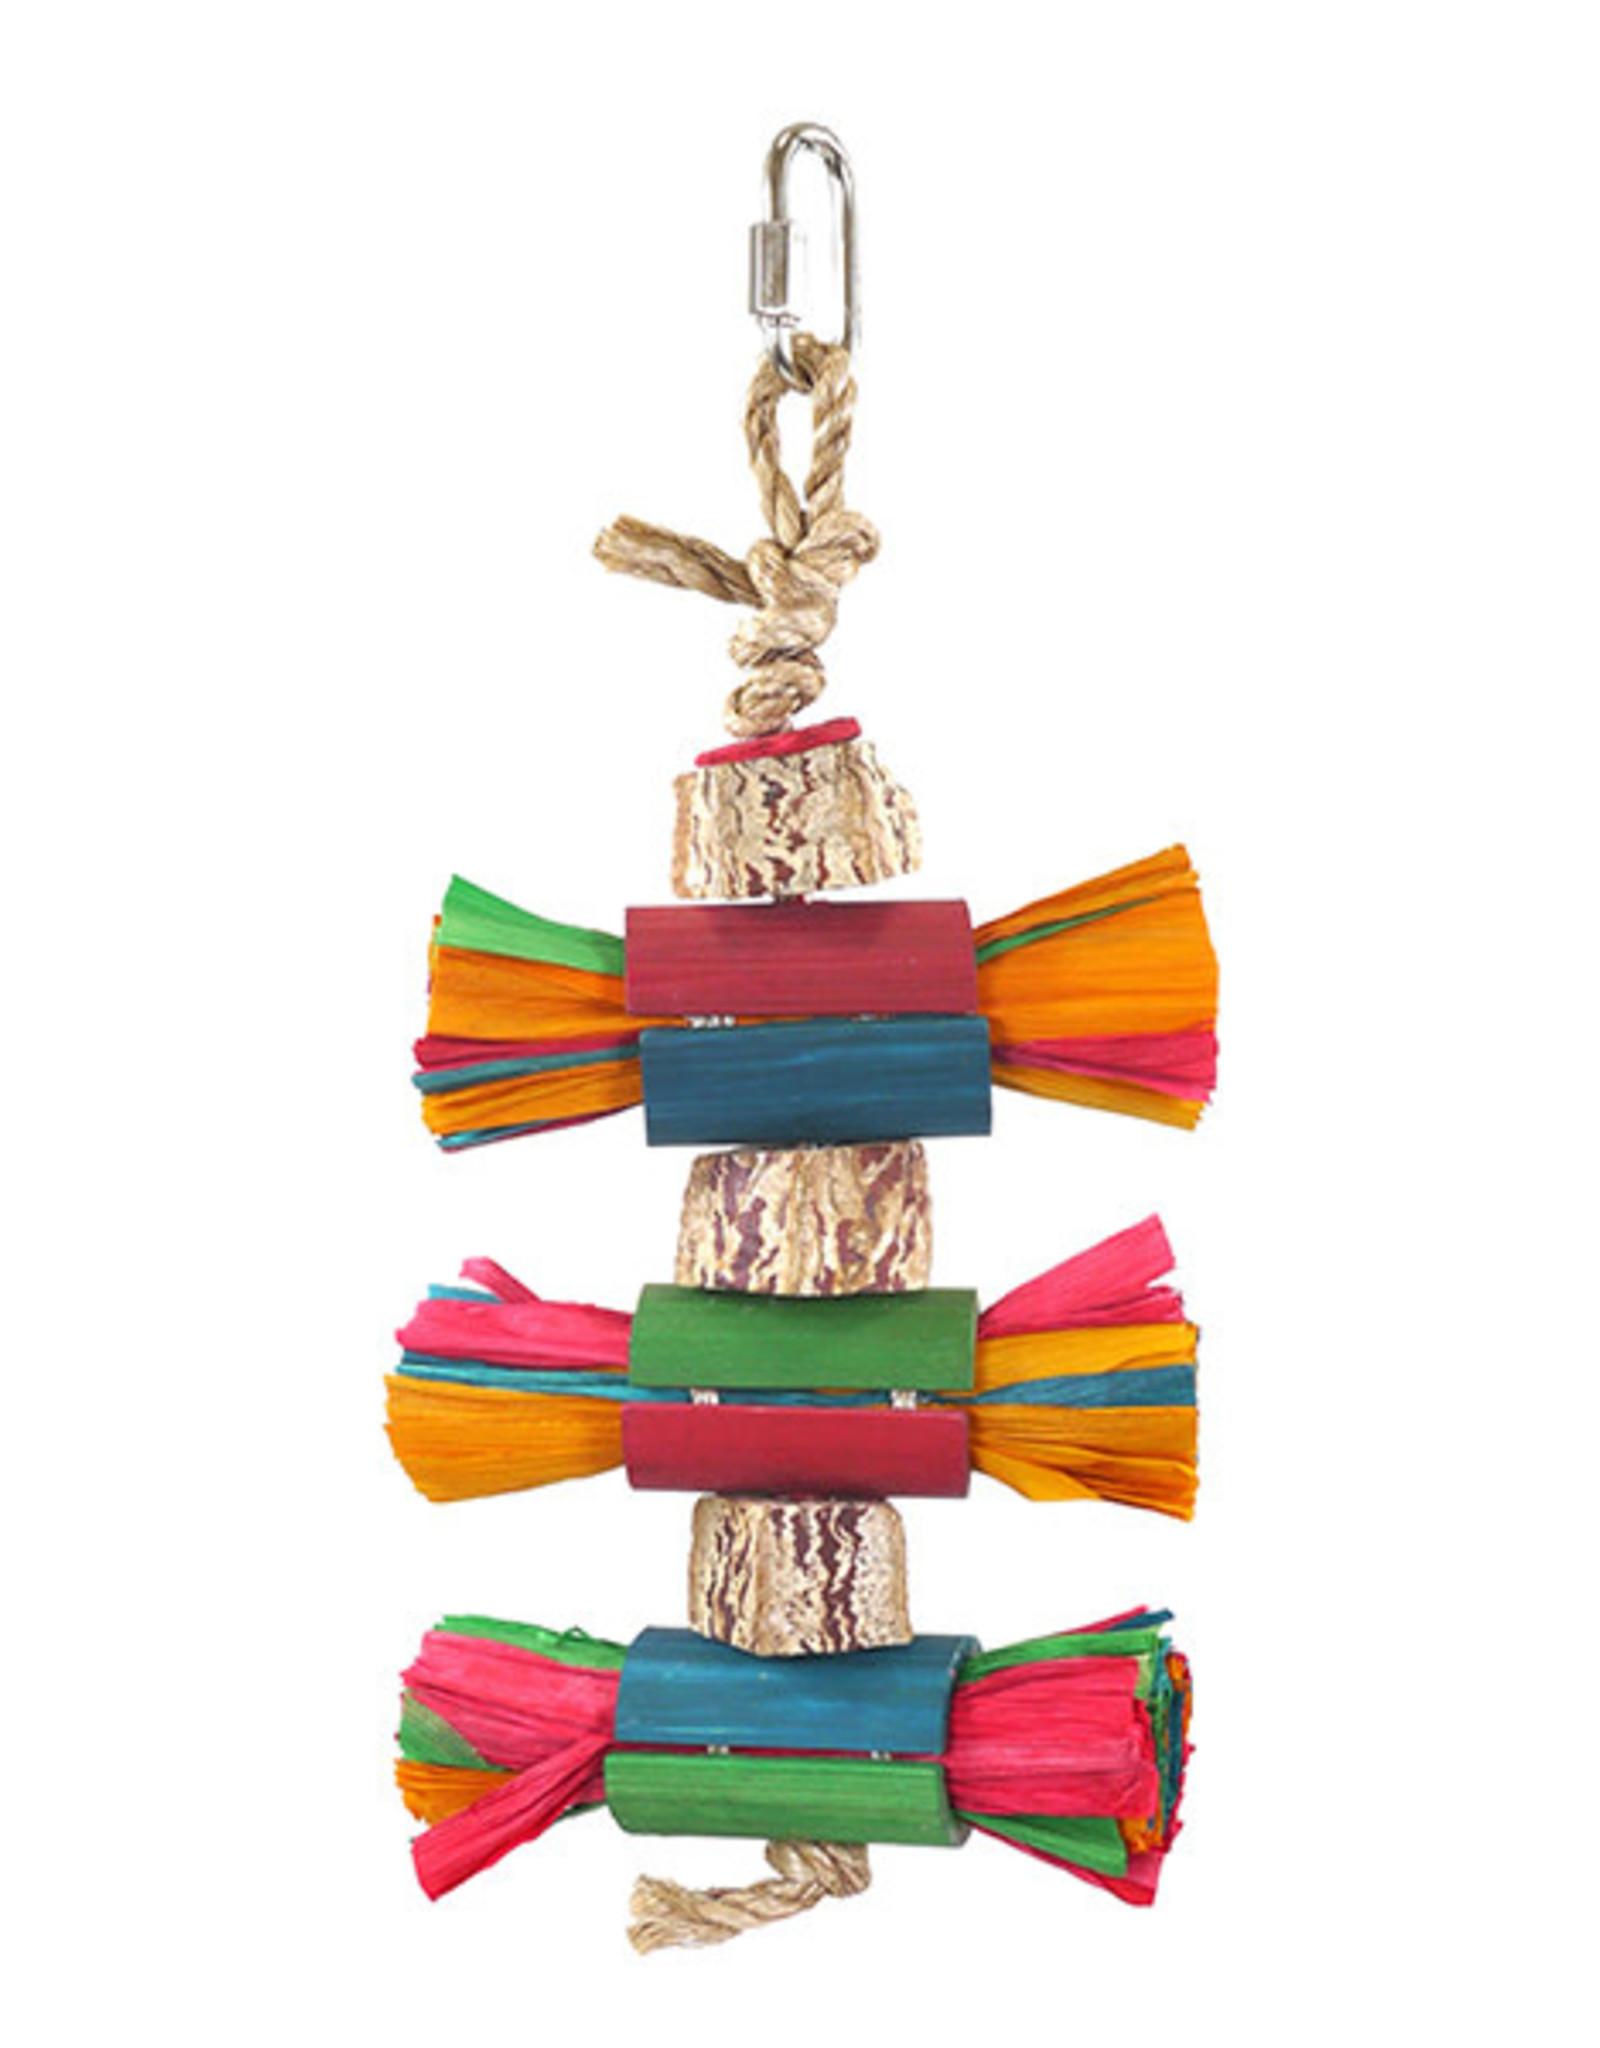 Rosewood Fun n Forage Rustle Rollers Small Animal Toy